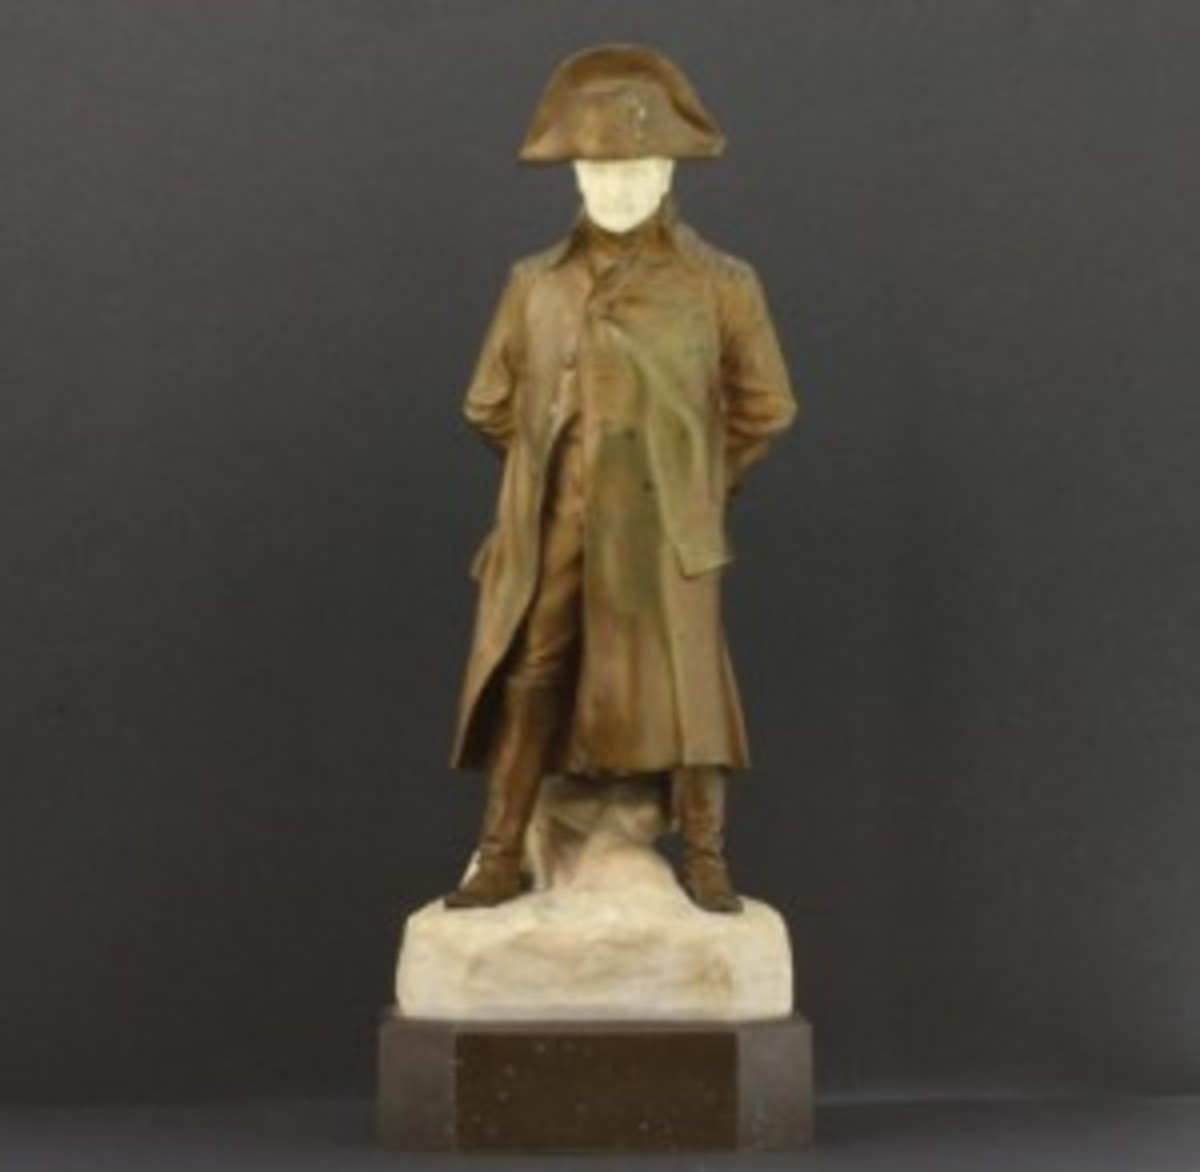 Napoleon figure